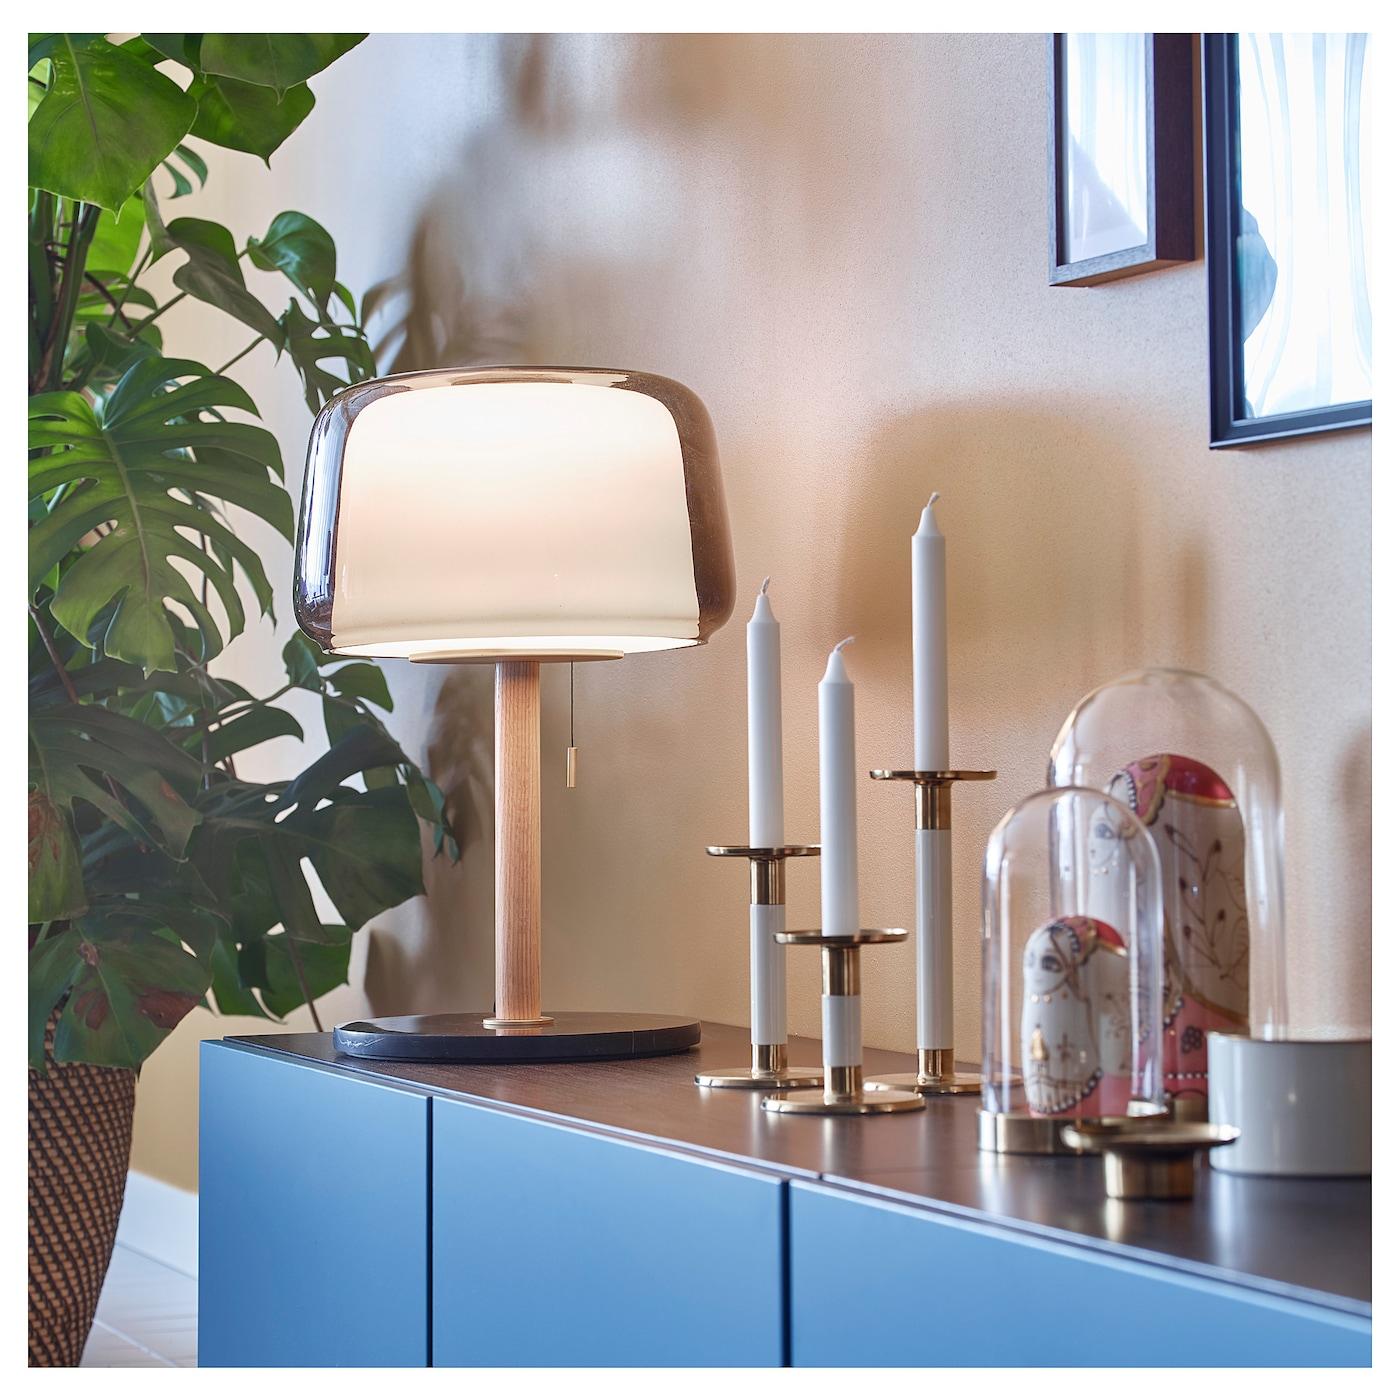 EVEDAL Bordslampa marmorgrå